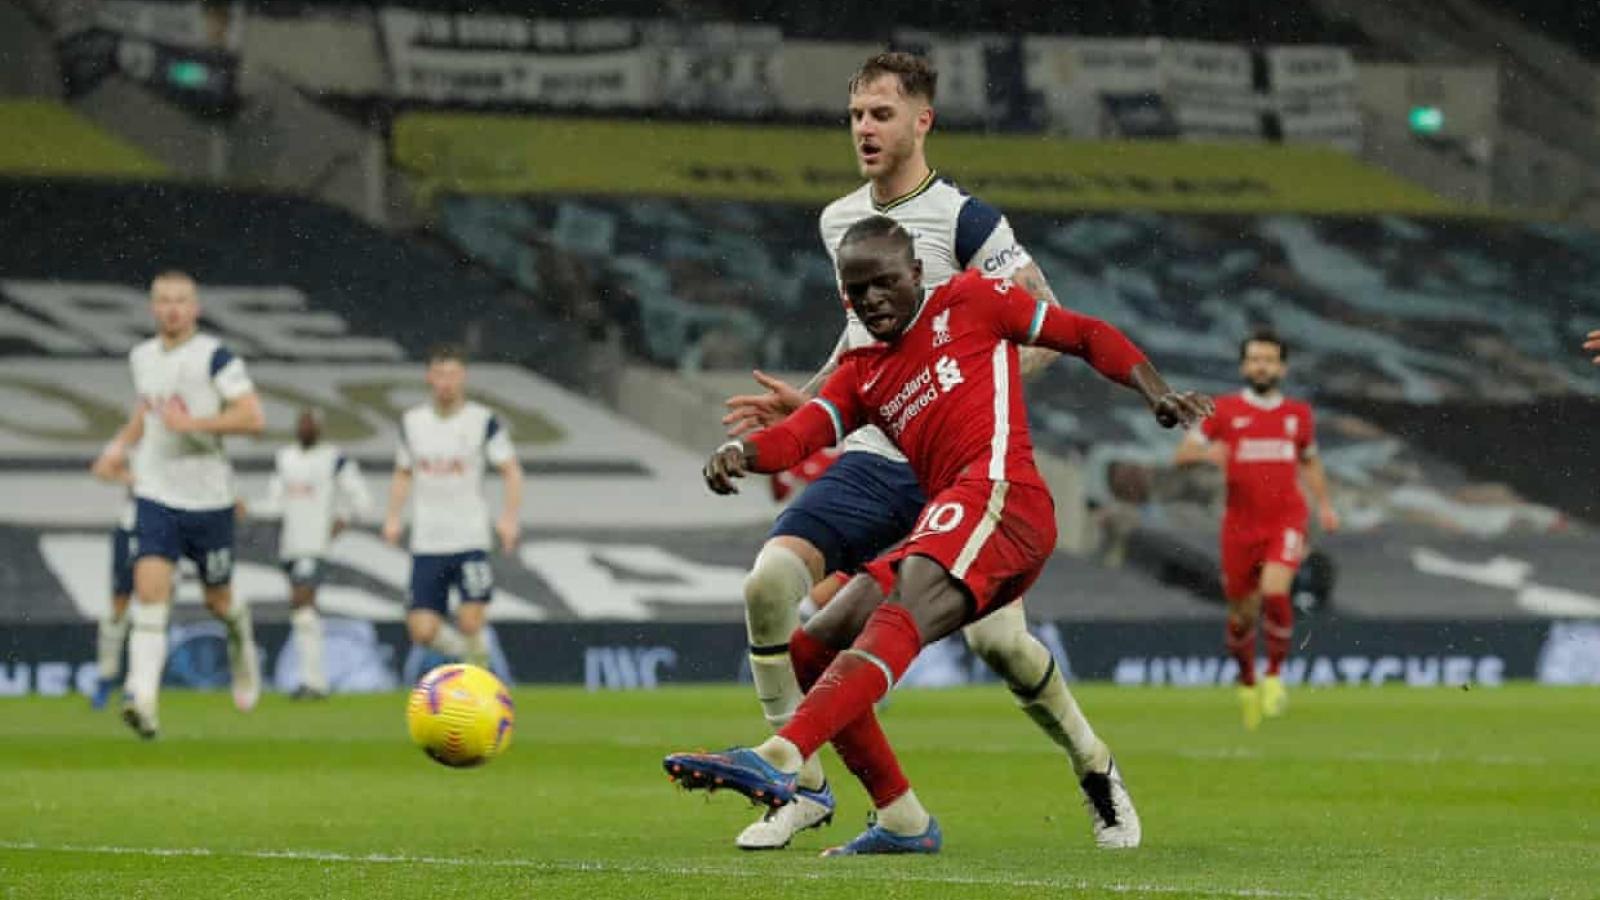 Mane nhấn chìm Tottenham, Liverpool tìm lại niềm vui ở Premier League